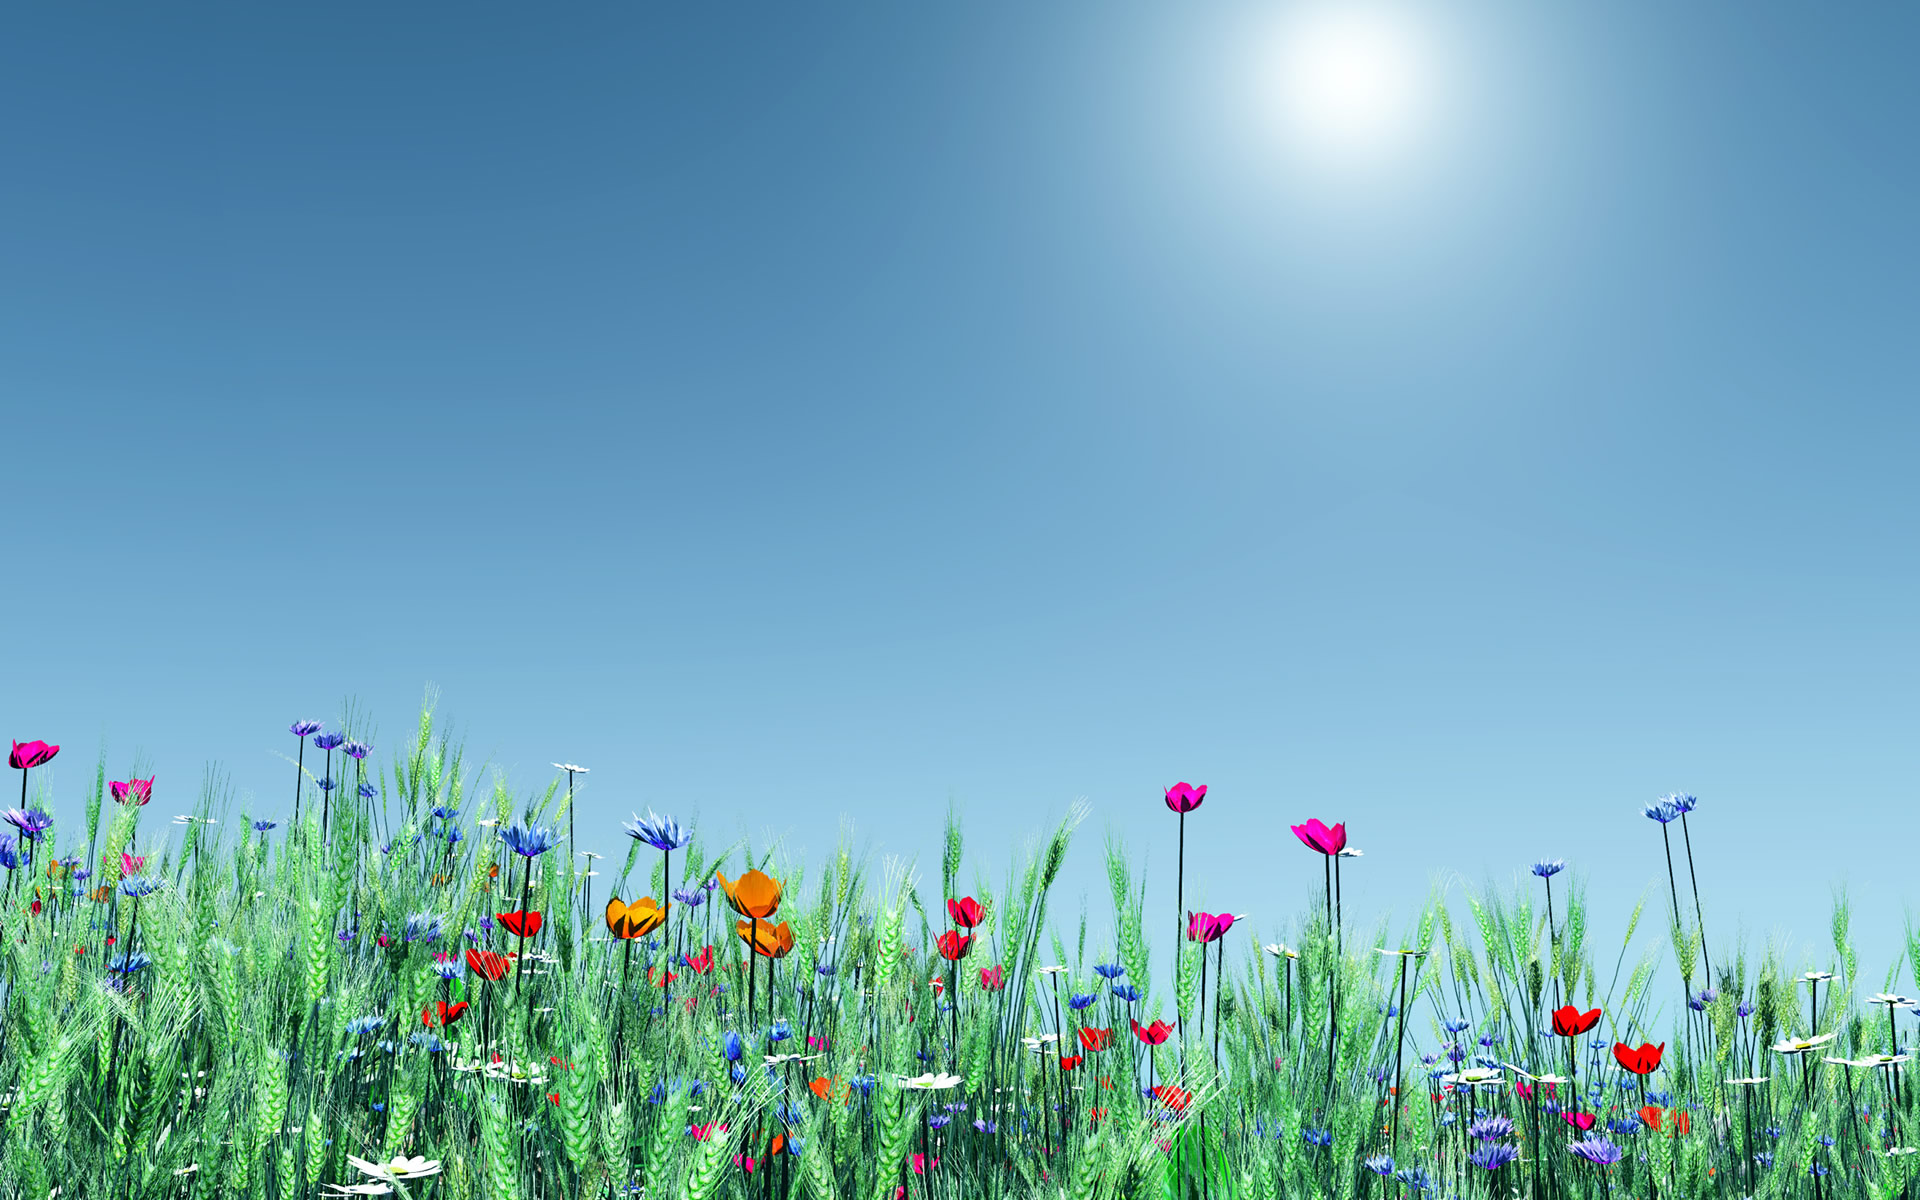 Spring Flowers Wallpaper (15)